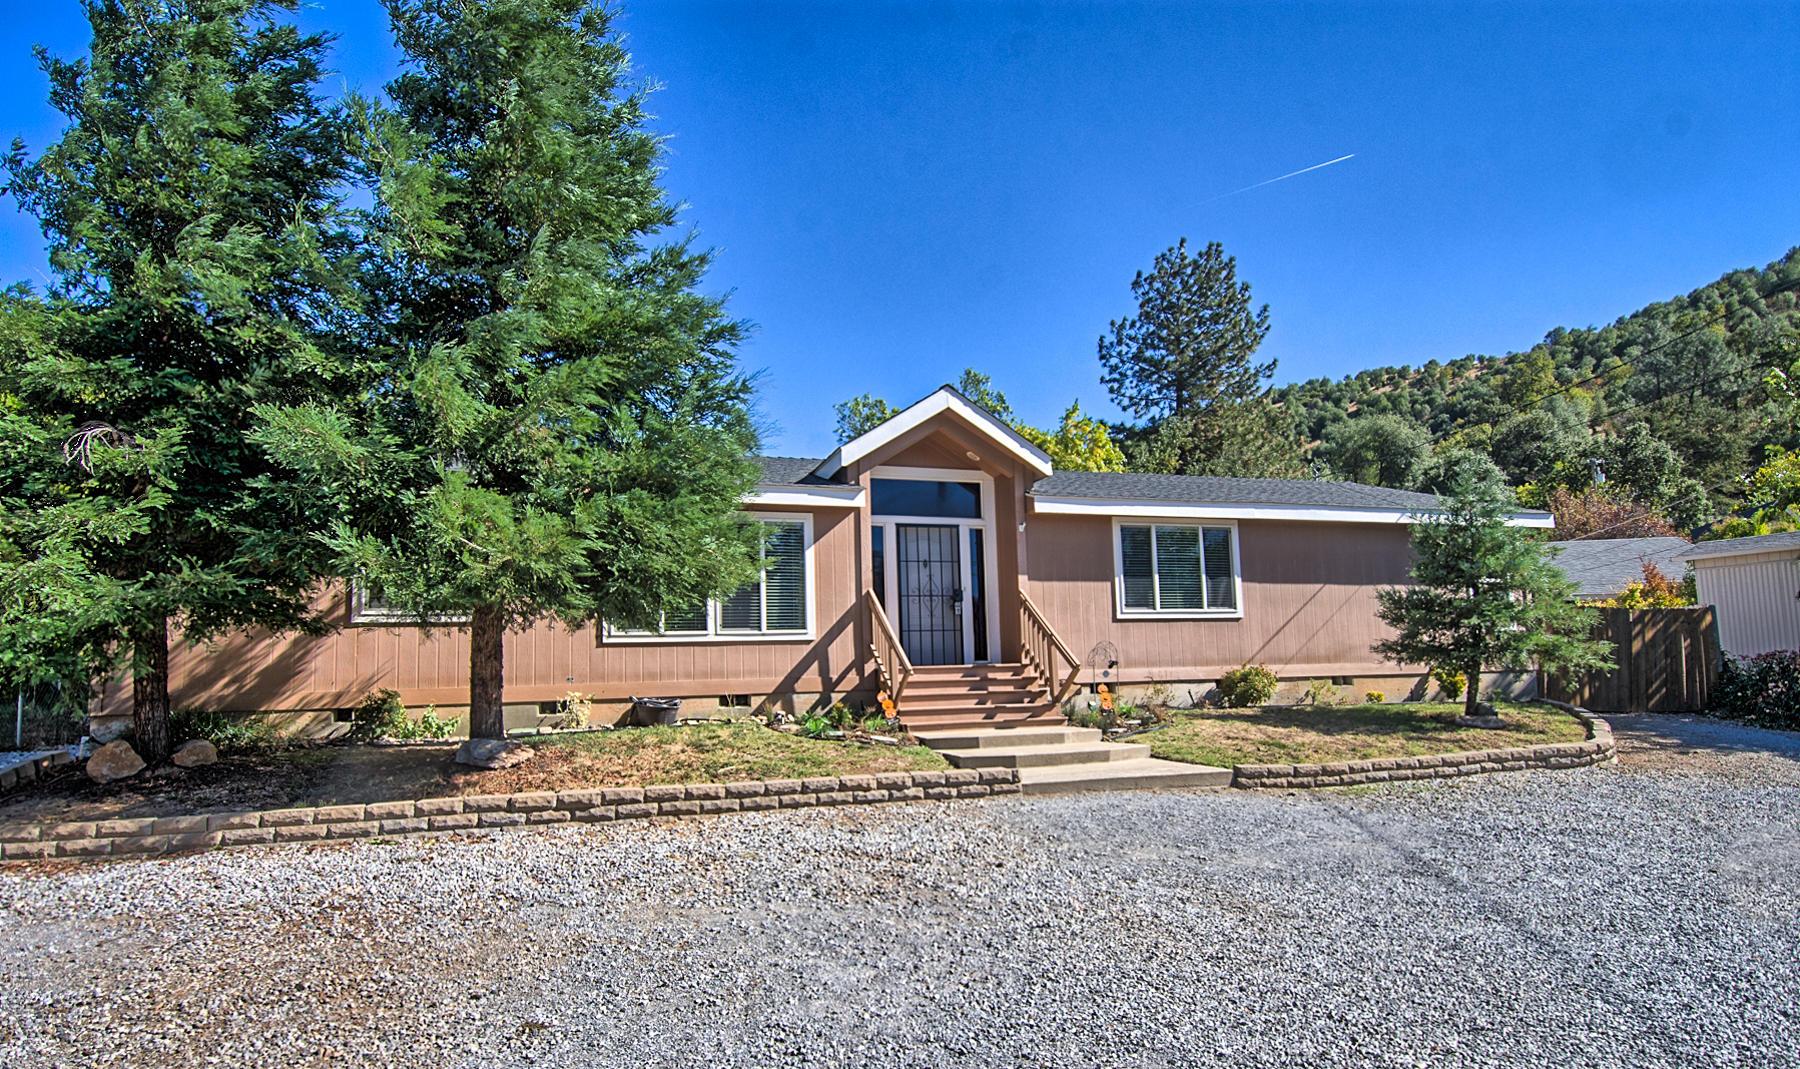 14867 Ravine Rd, Redding, CA 96003